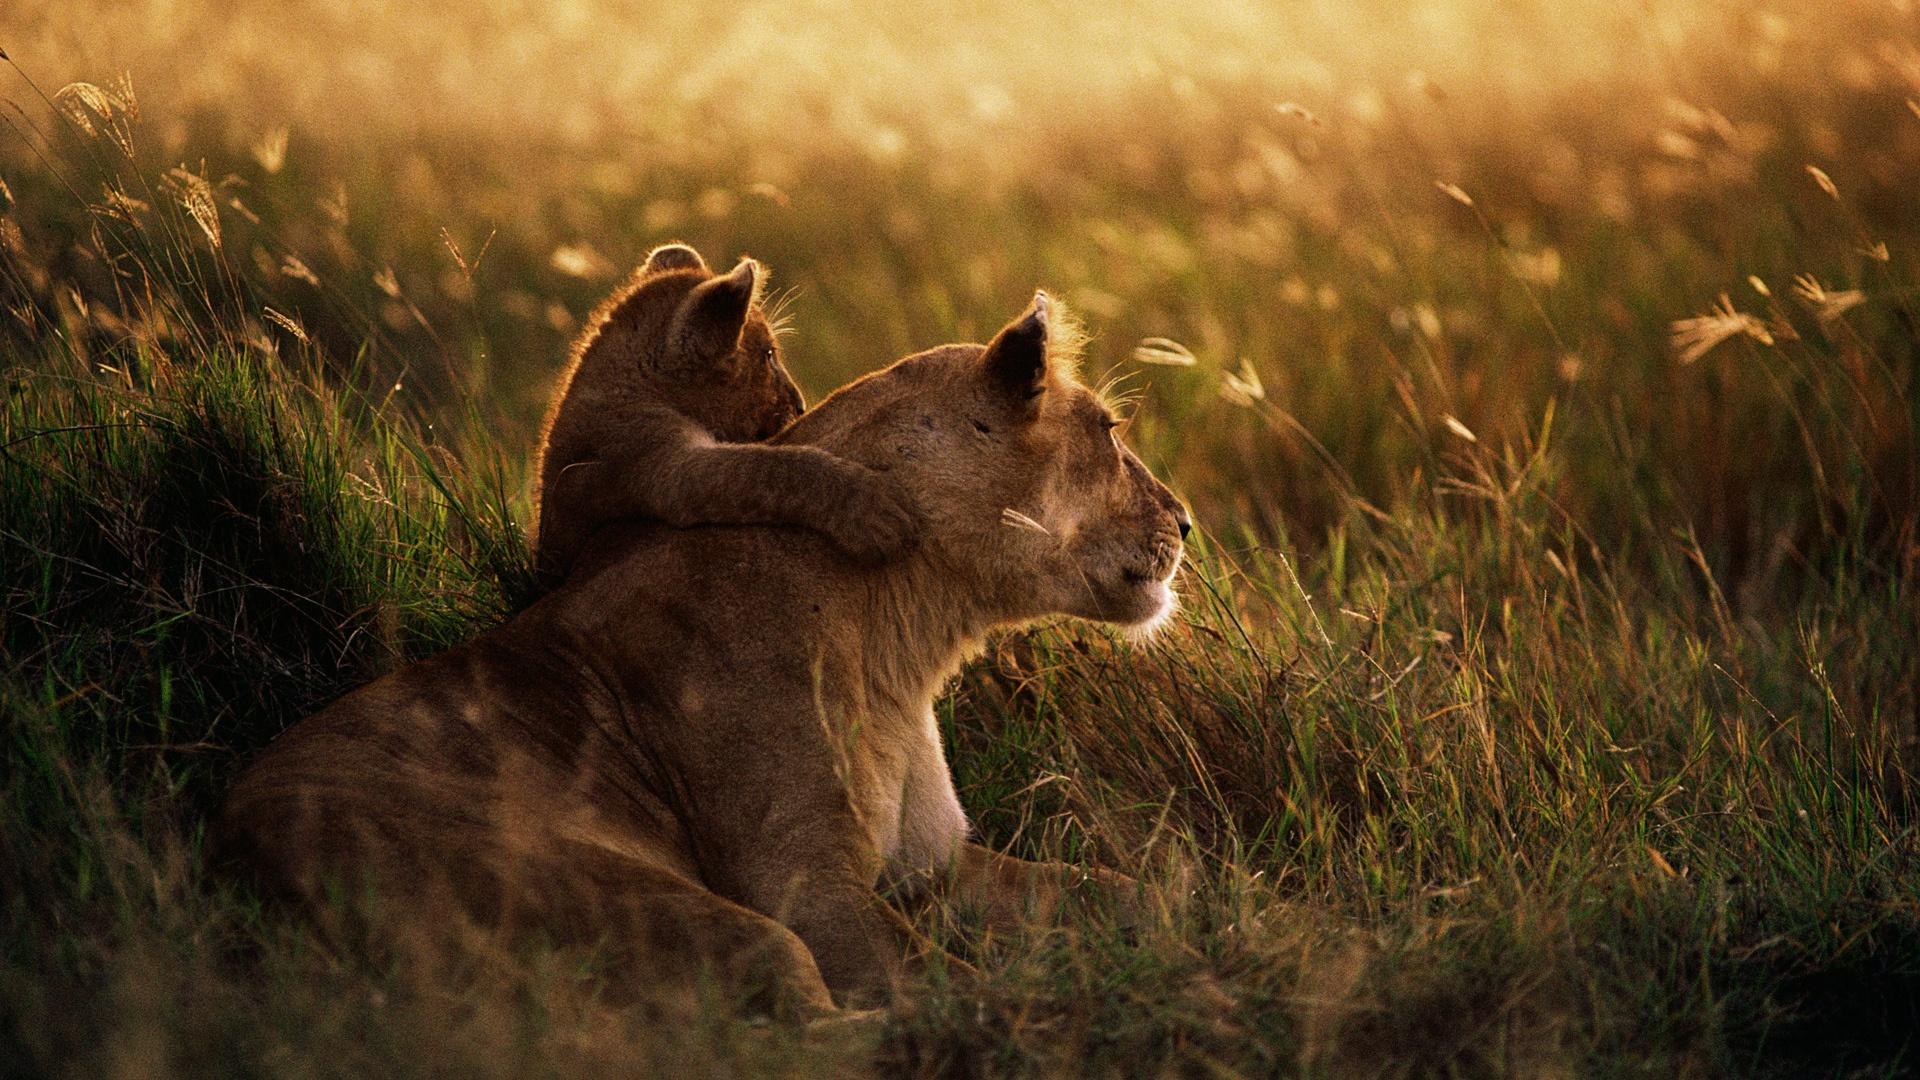 http://1.bp.blogspot.com/-30fyRNg091U/UGmboWIVzuI/AAAAAAAALDc/12AqaOmJ7mQ/s0/african-lion-1920x1080.jpg